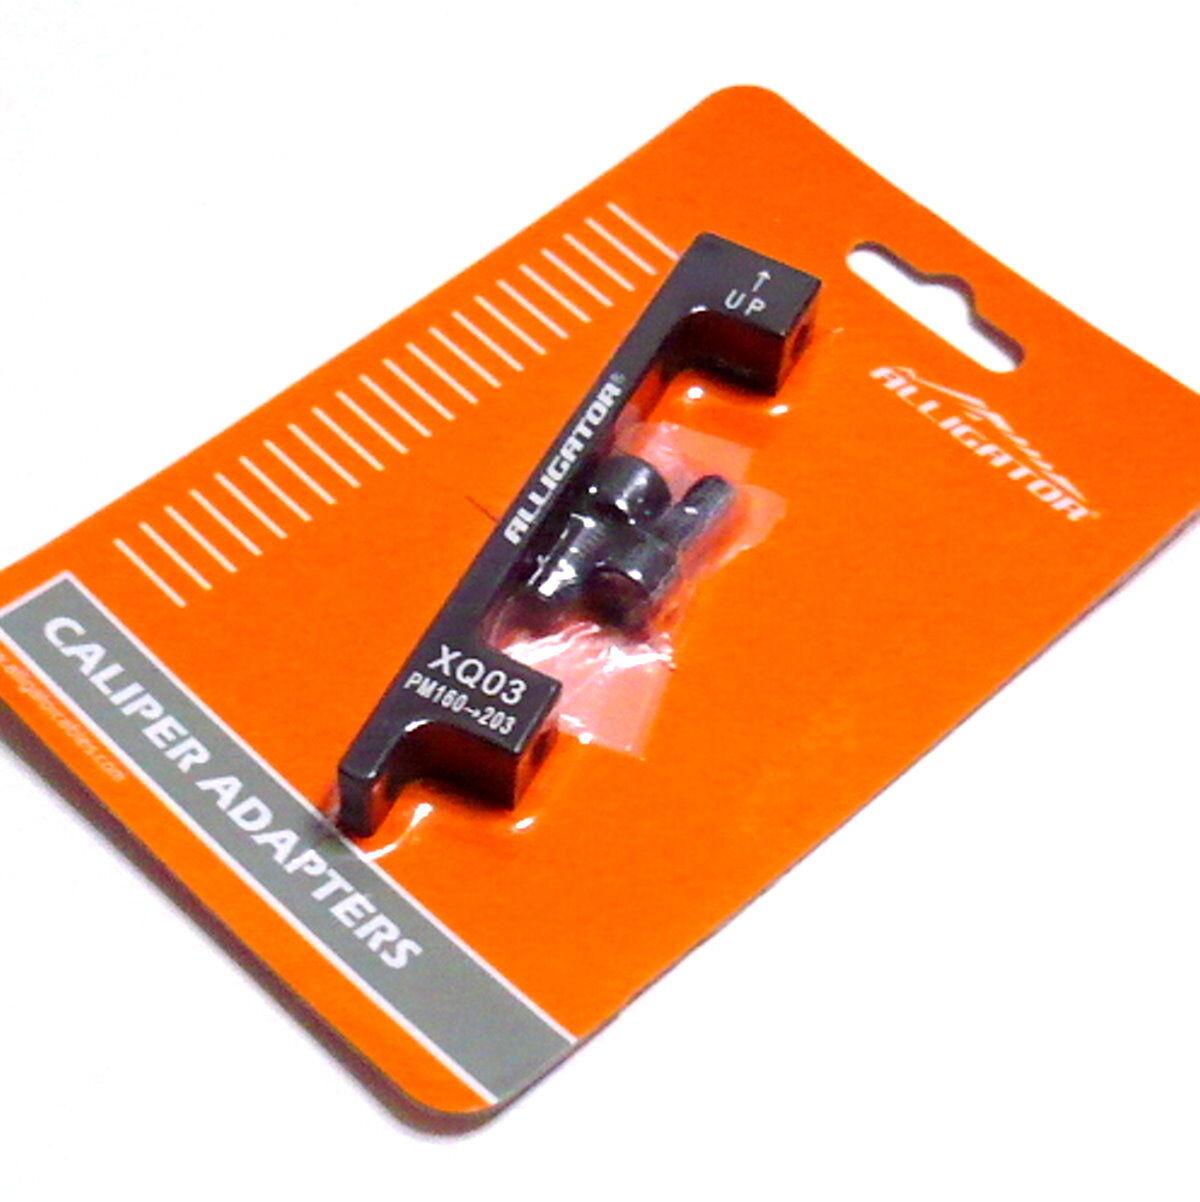 D83 F 180mm R 160mm gobike88 Alligator CNC Adaptor IS Fork//Frame to PM Caliper